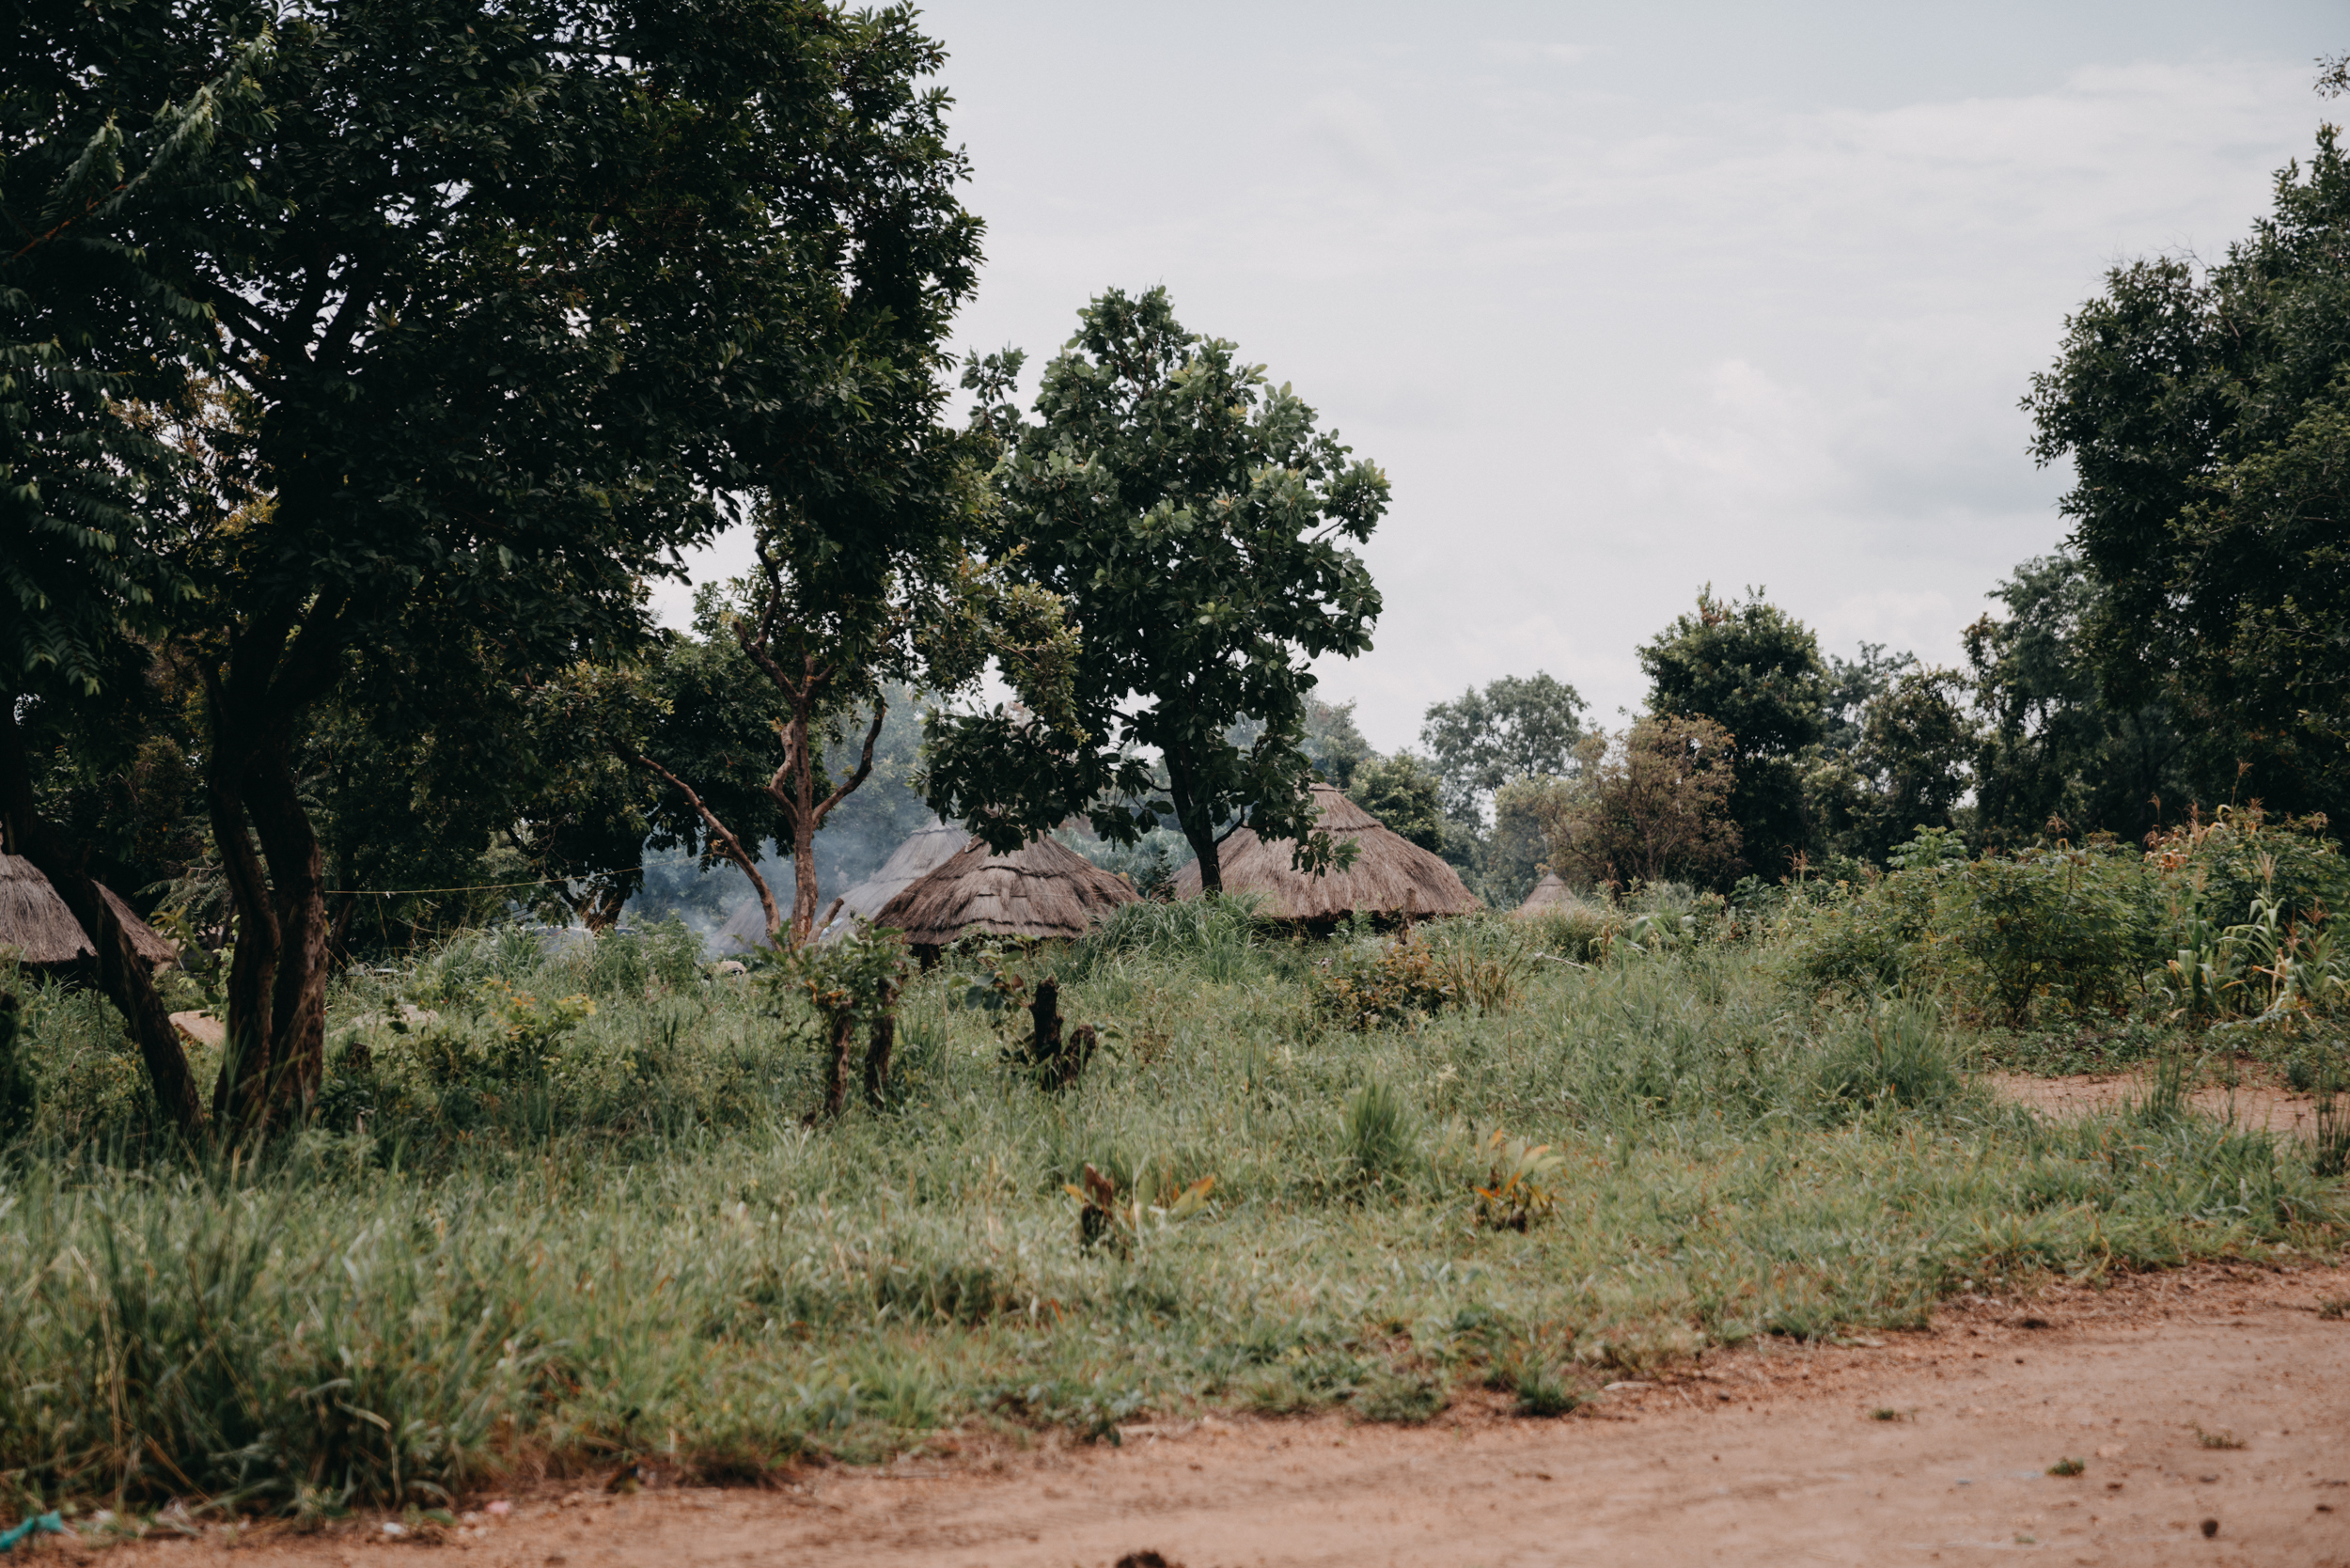 uganda july 2018-139.jpg